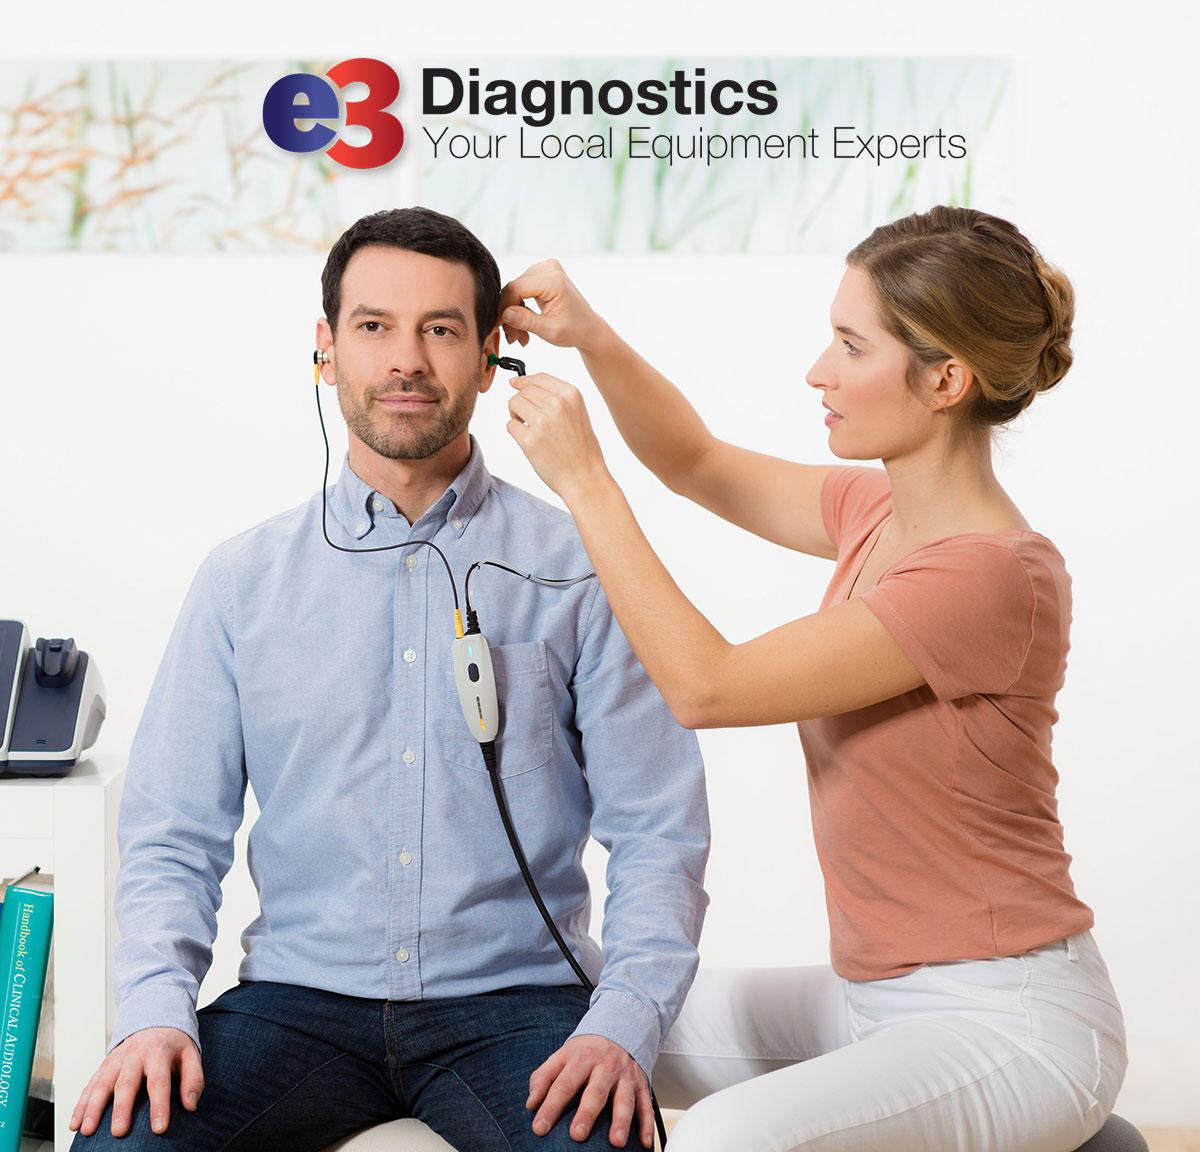 e3_diagnostics_1200x1152_2